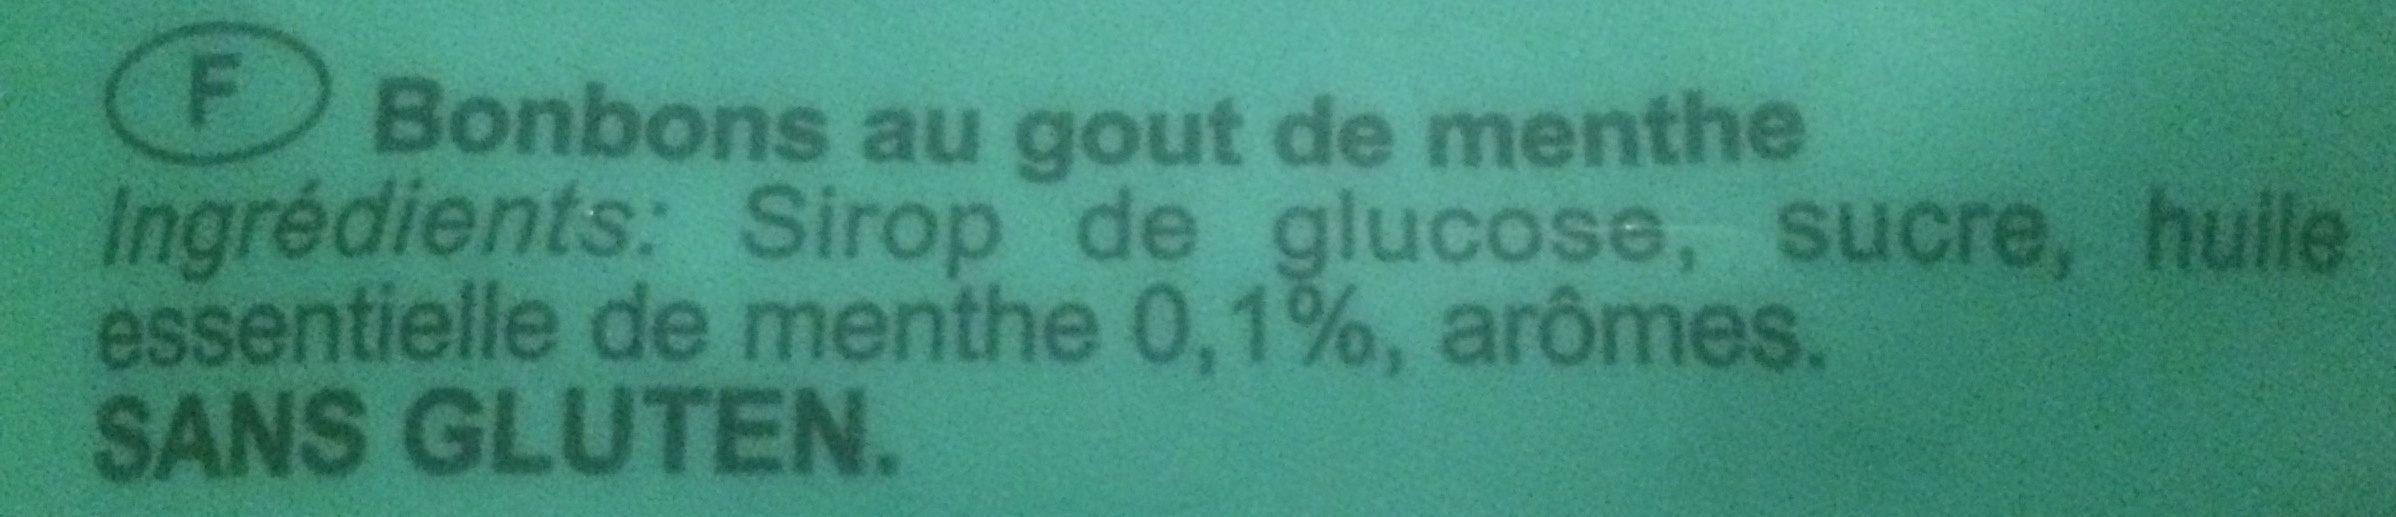 Liking Caramelle Menta Dura GR. 250 - Ingrediënten - fr